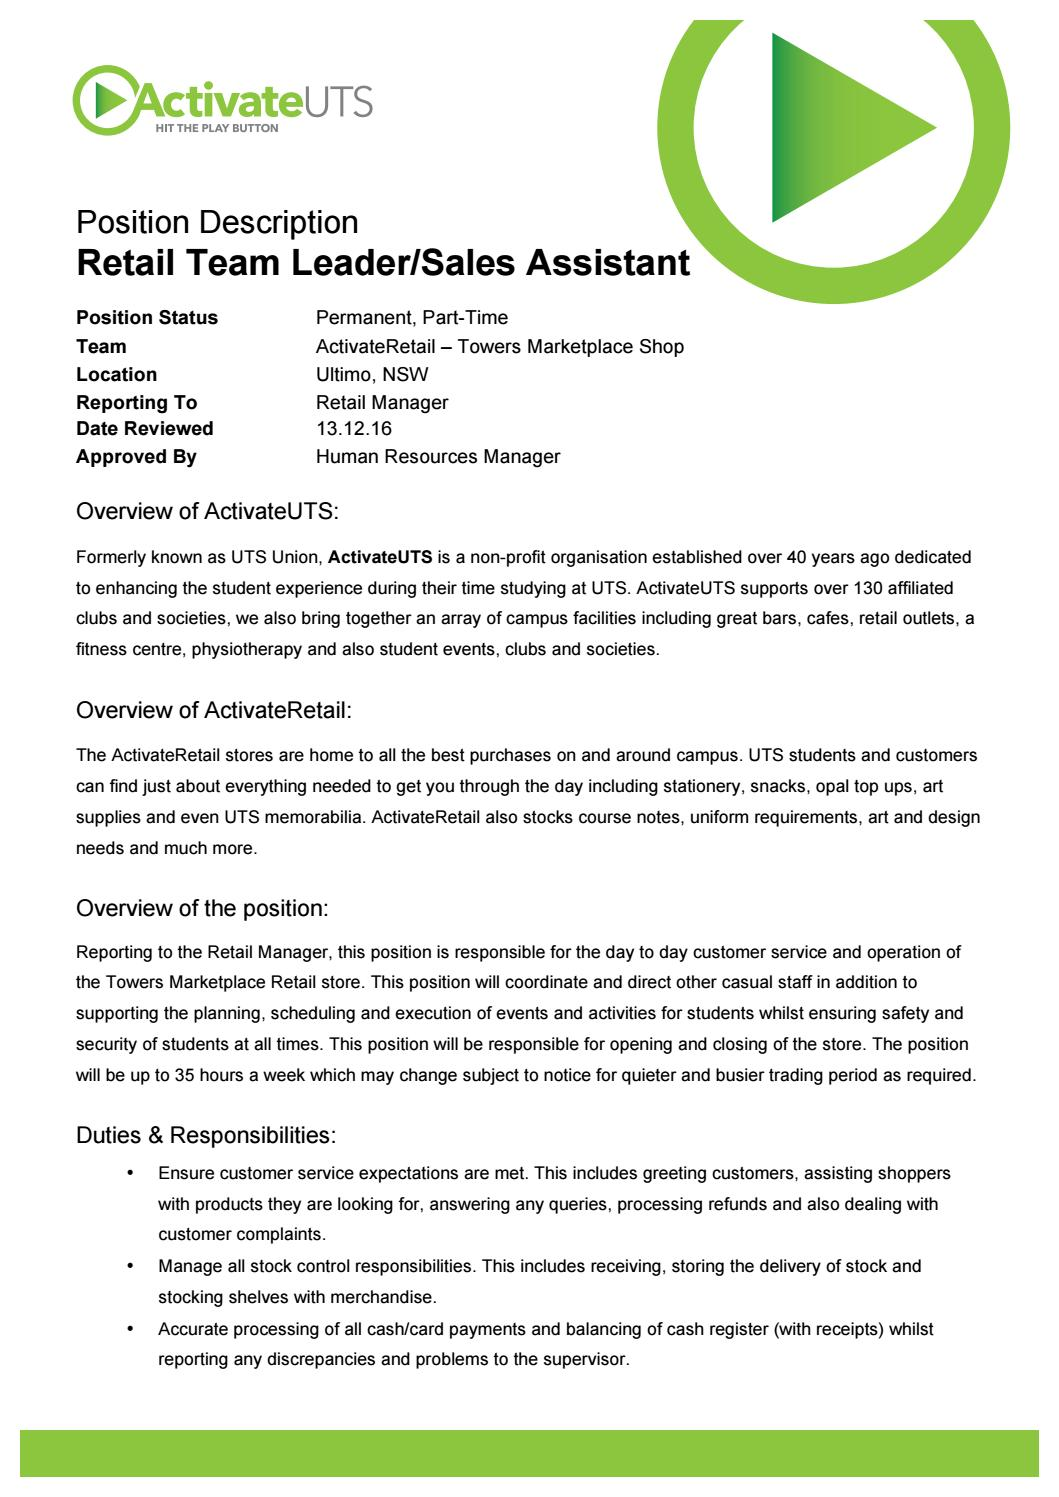 Retail Team Leader Position Description By Activateuts Issuu